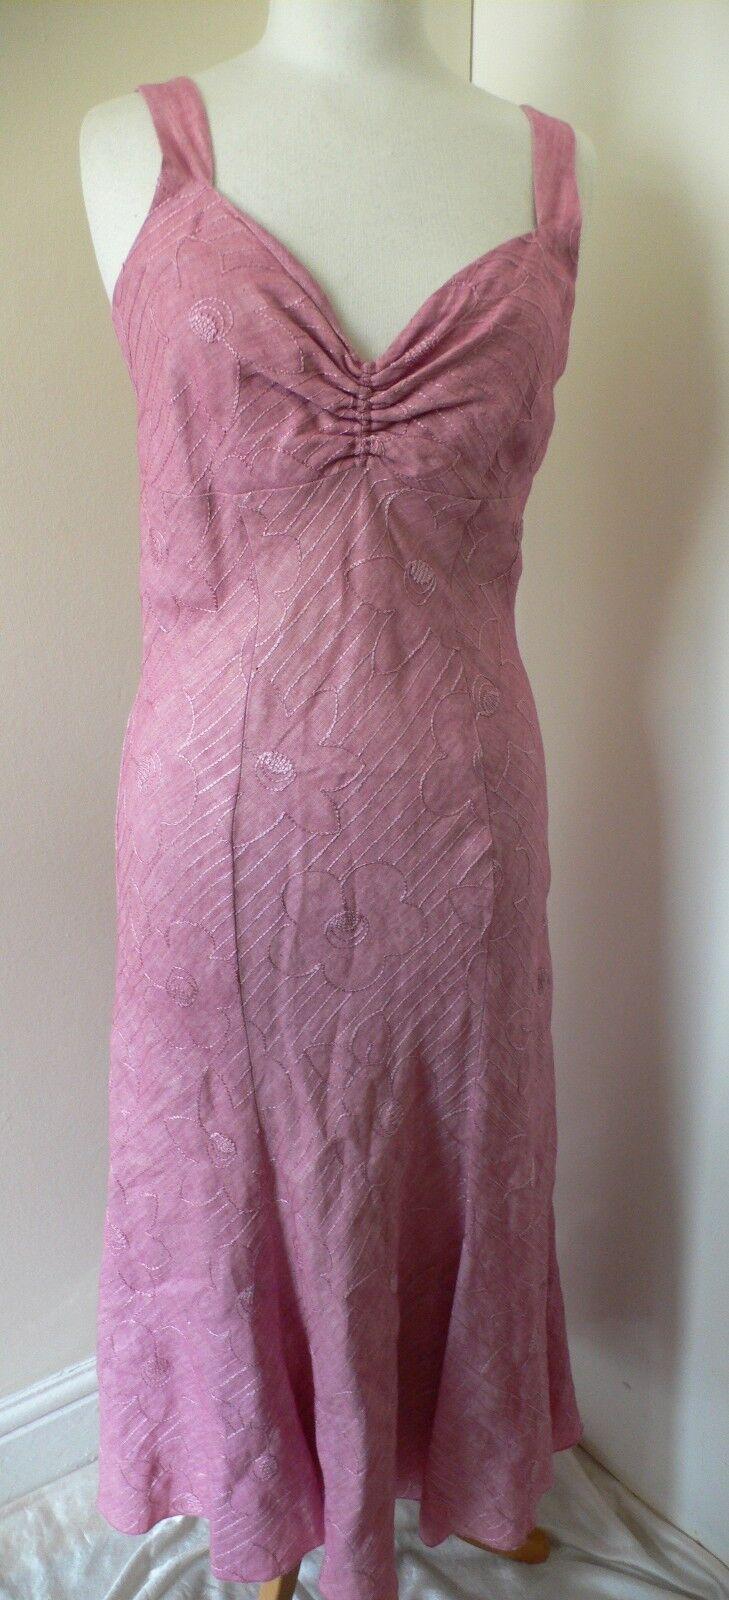 10-12 Pink Linen Dress by Sophia Pigozzi very 1930s Style Downton Durrells